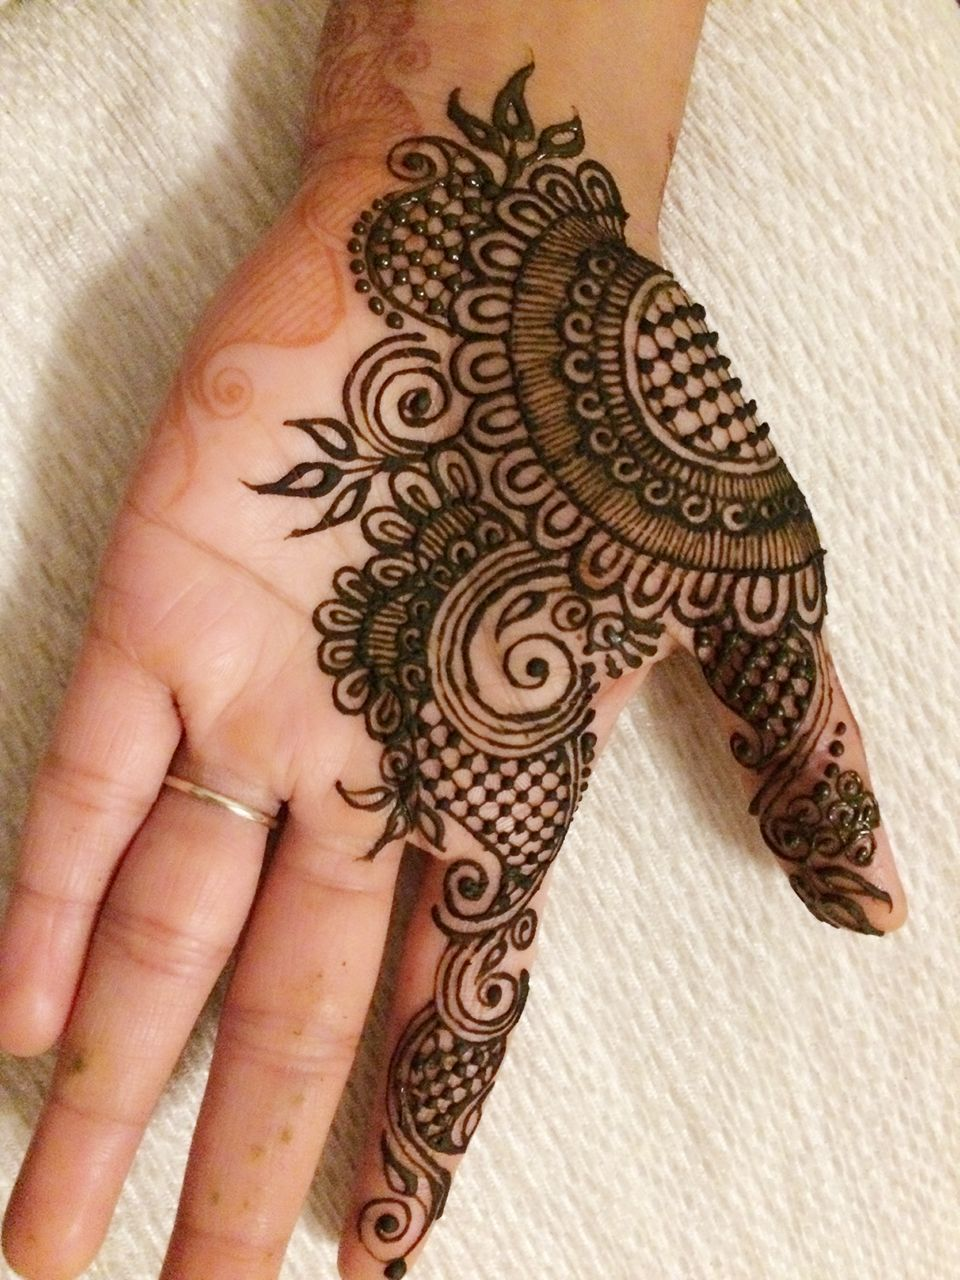 50 intricate henna tattoo designs art and design 50 - Top 50 Henna Tattoo Designs Best Tattoos Designs Ideas For Men Women